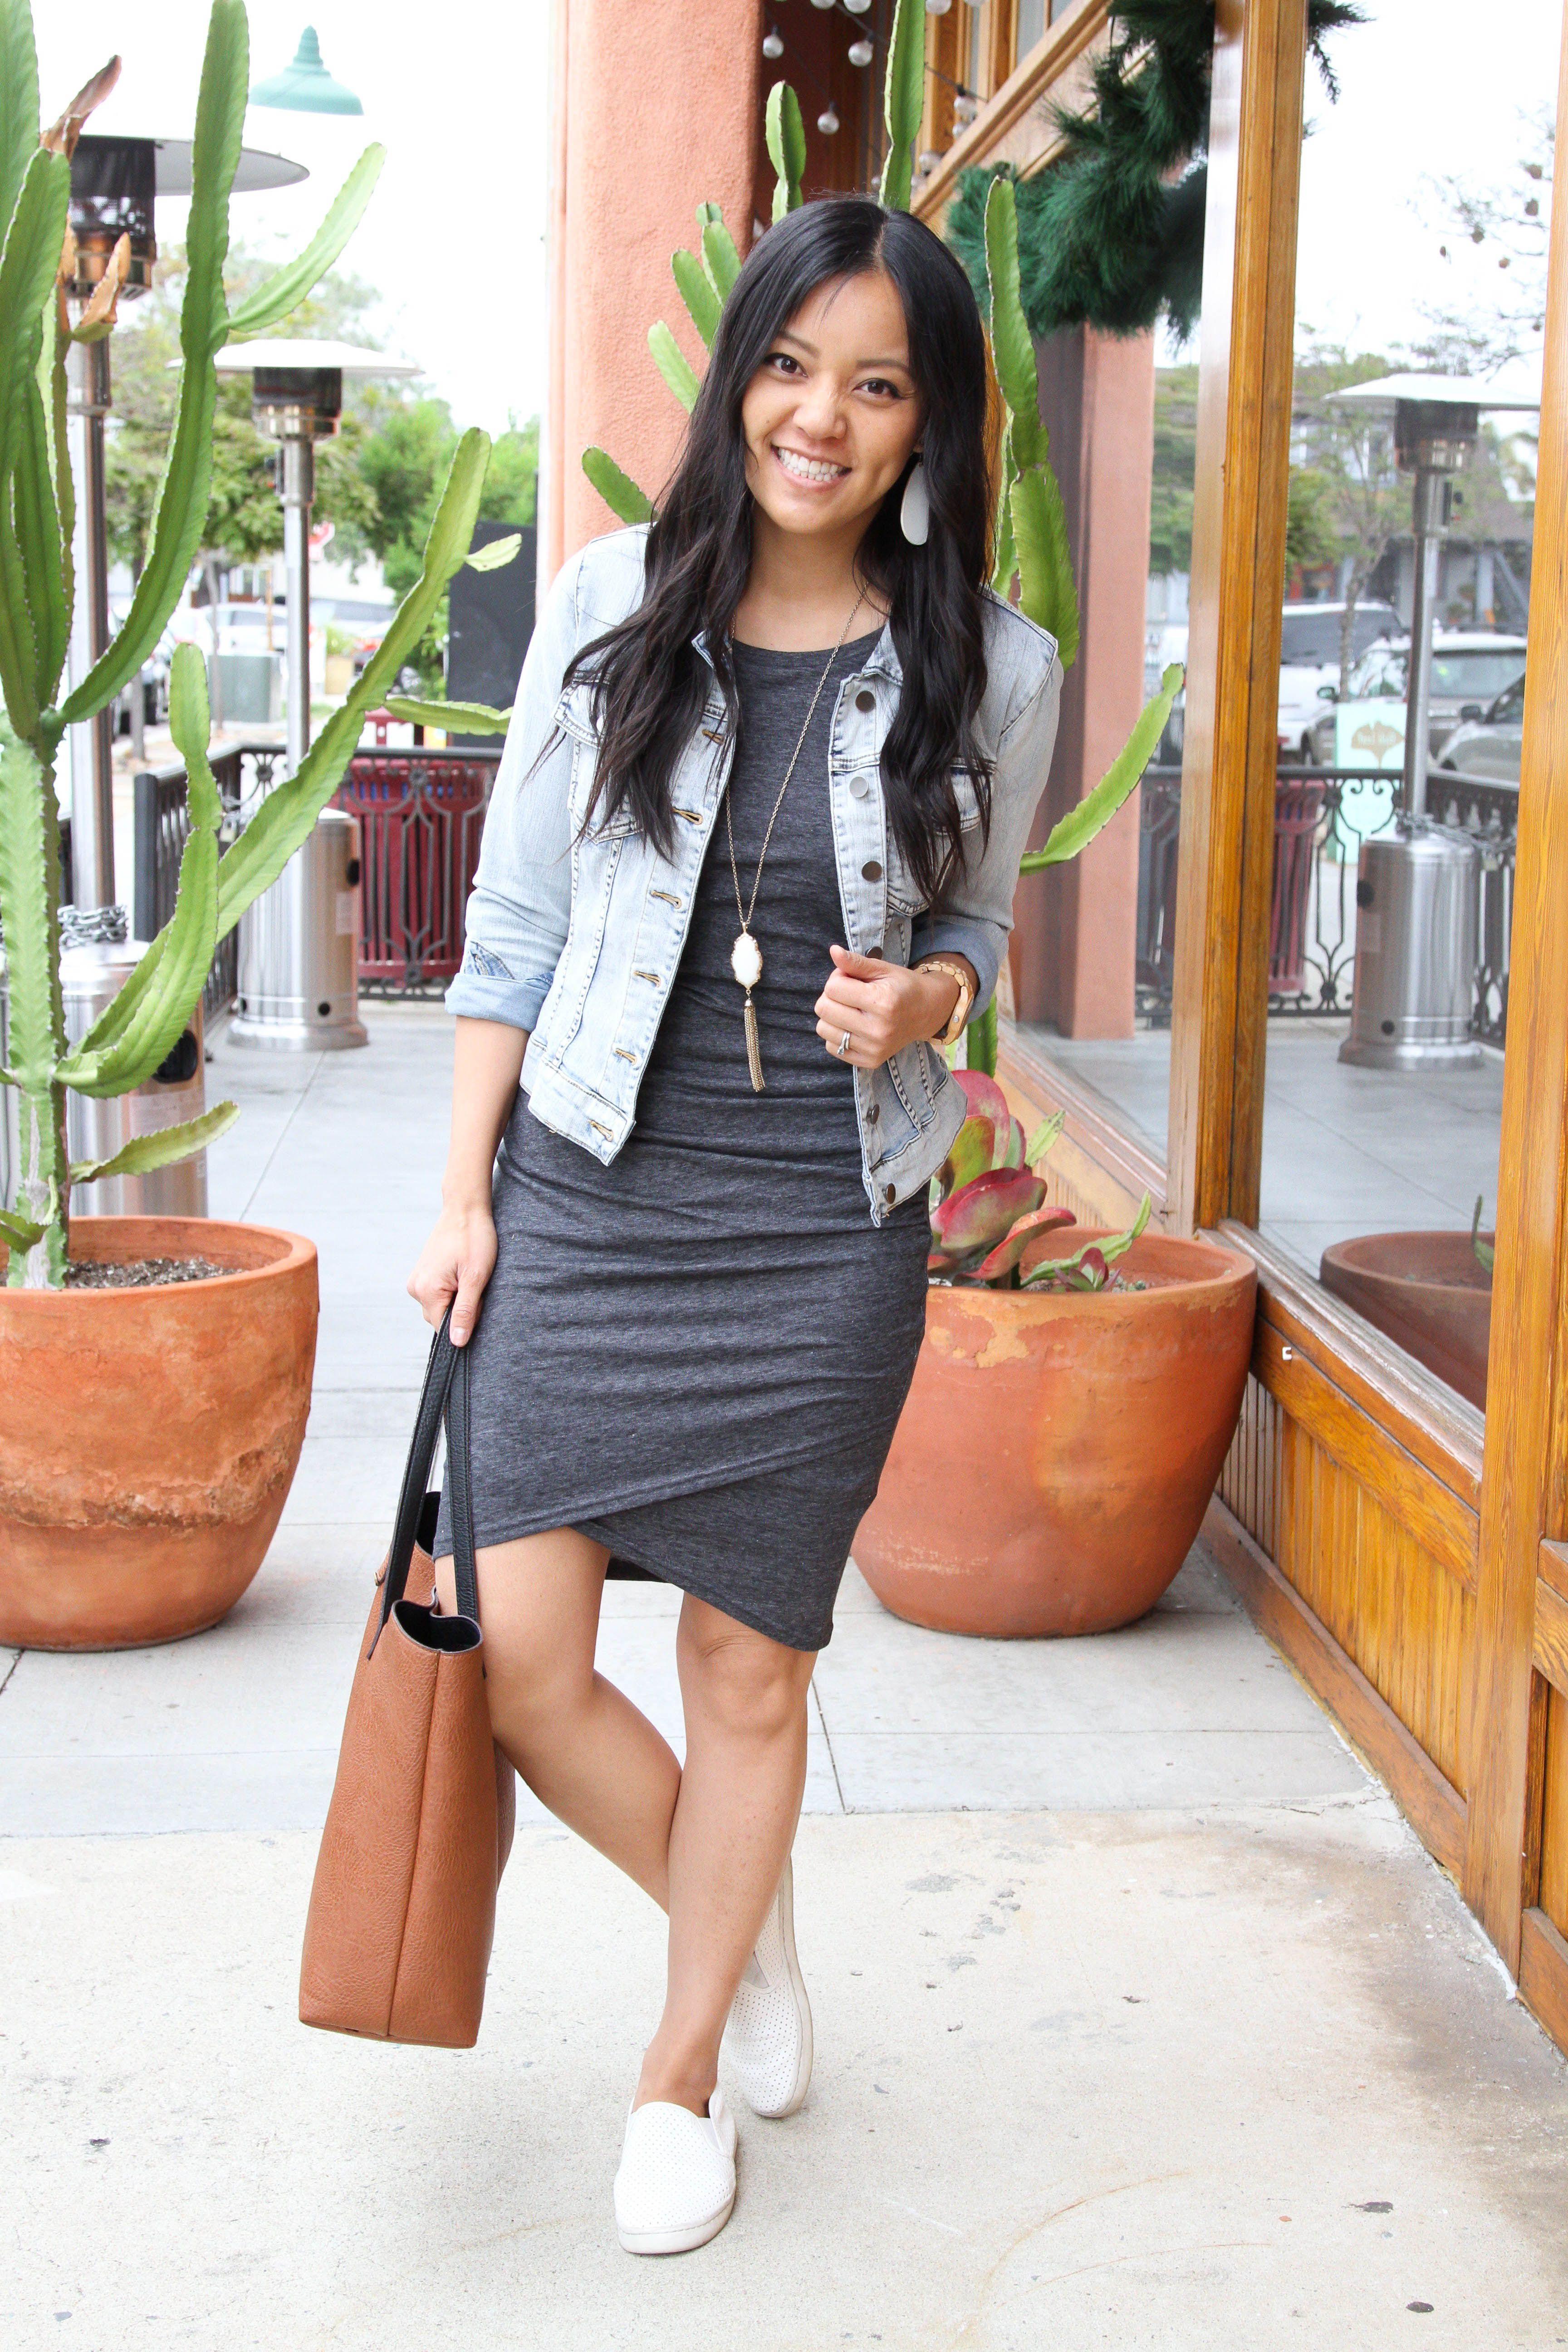 d60b549711a2 grey ruched dress+ white sneakers + denim jacket + pendant necklace +  cognac tote